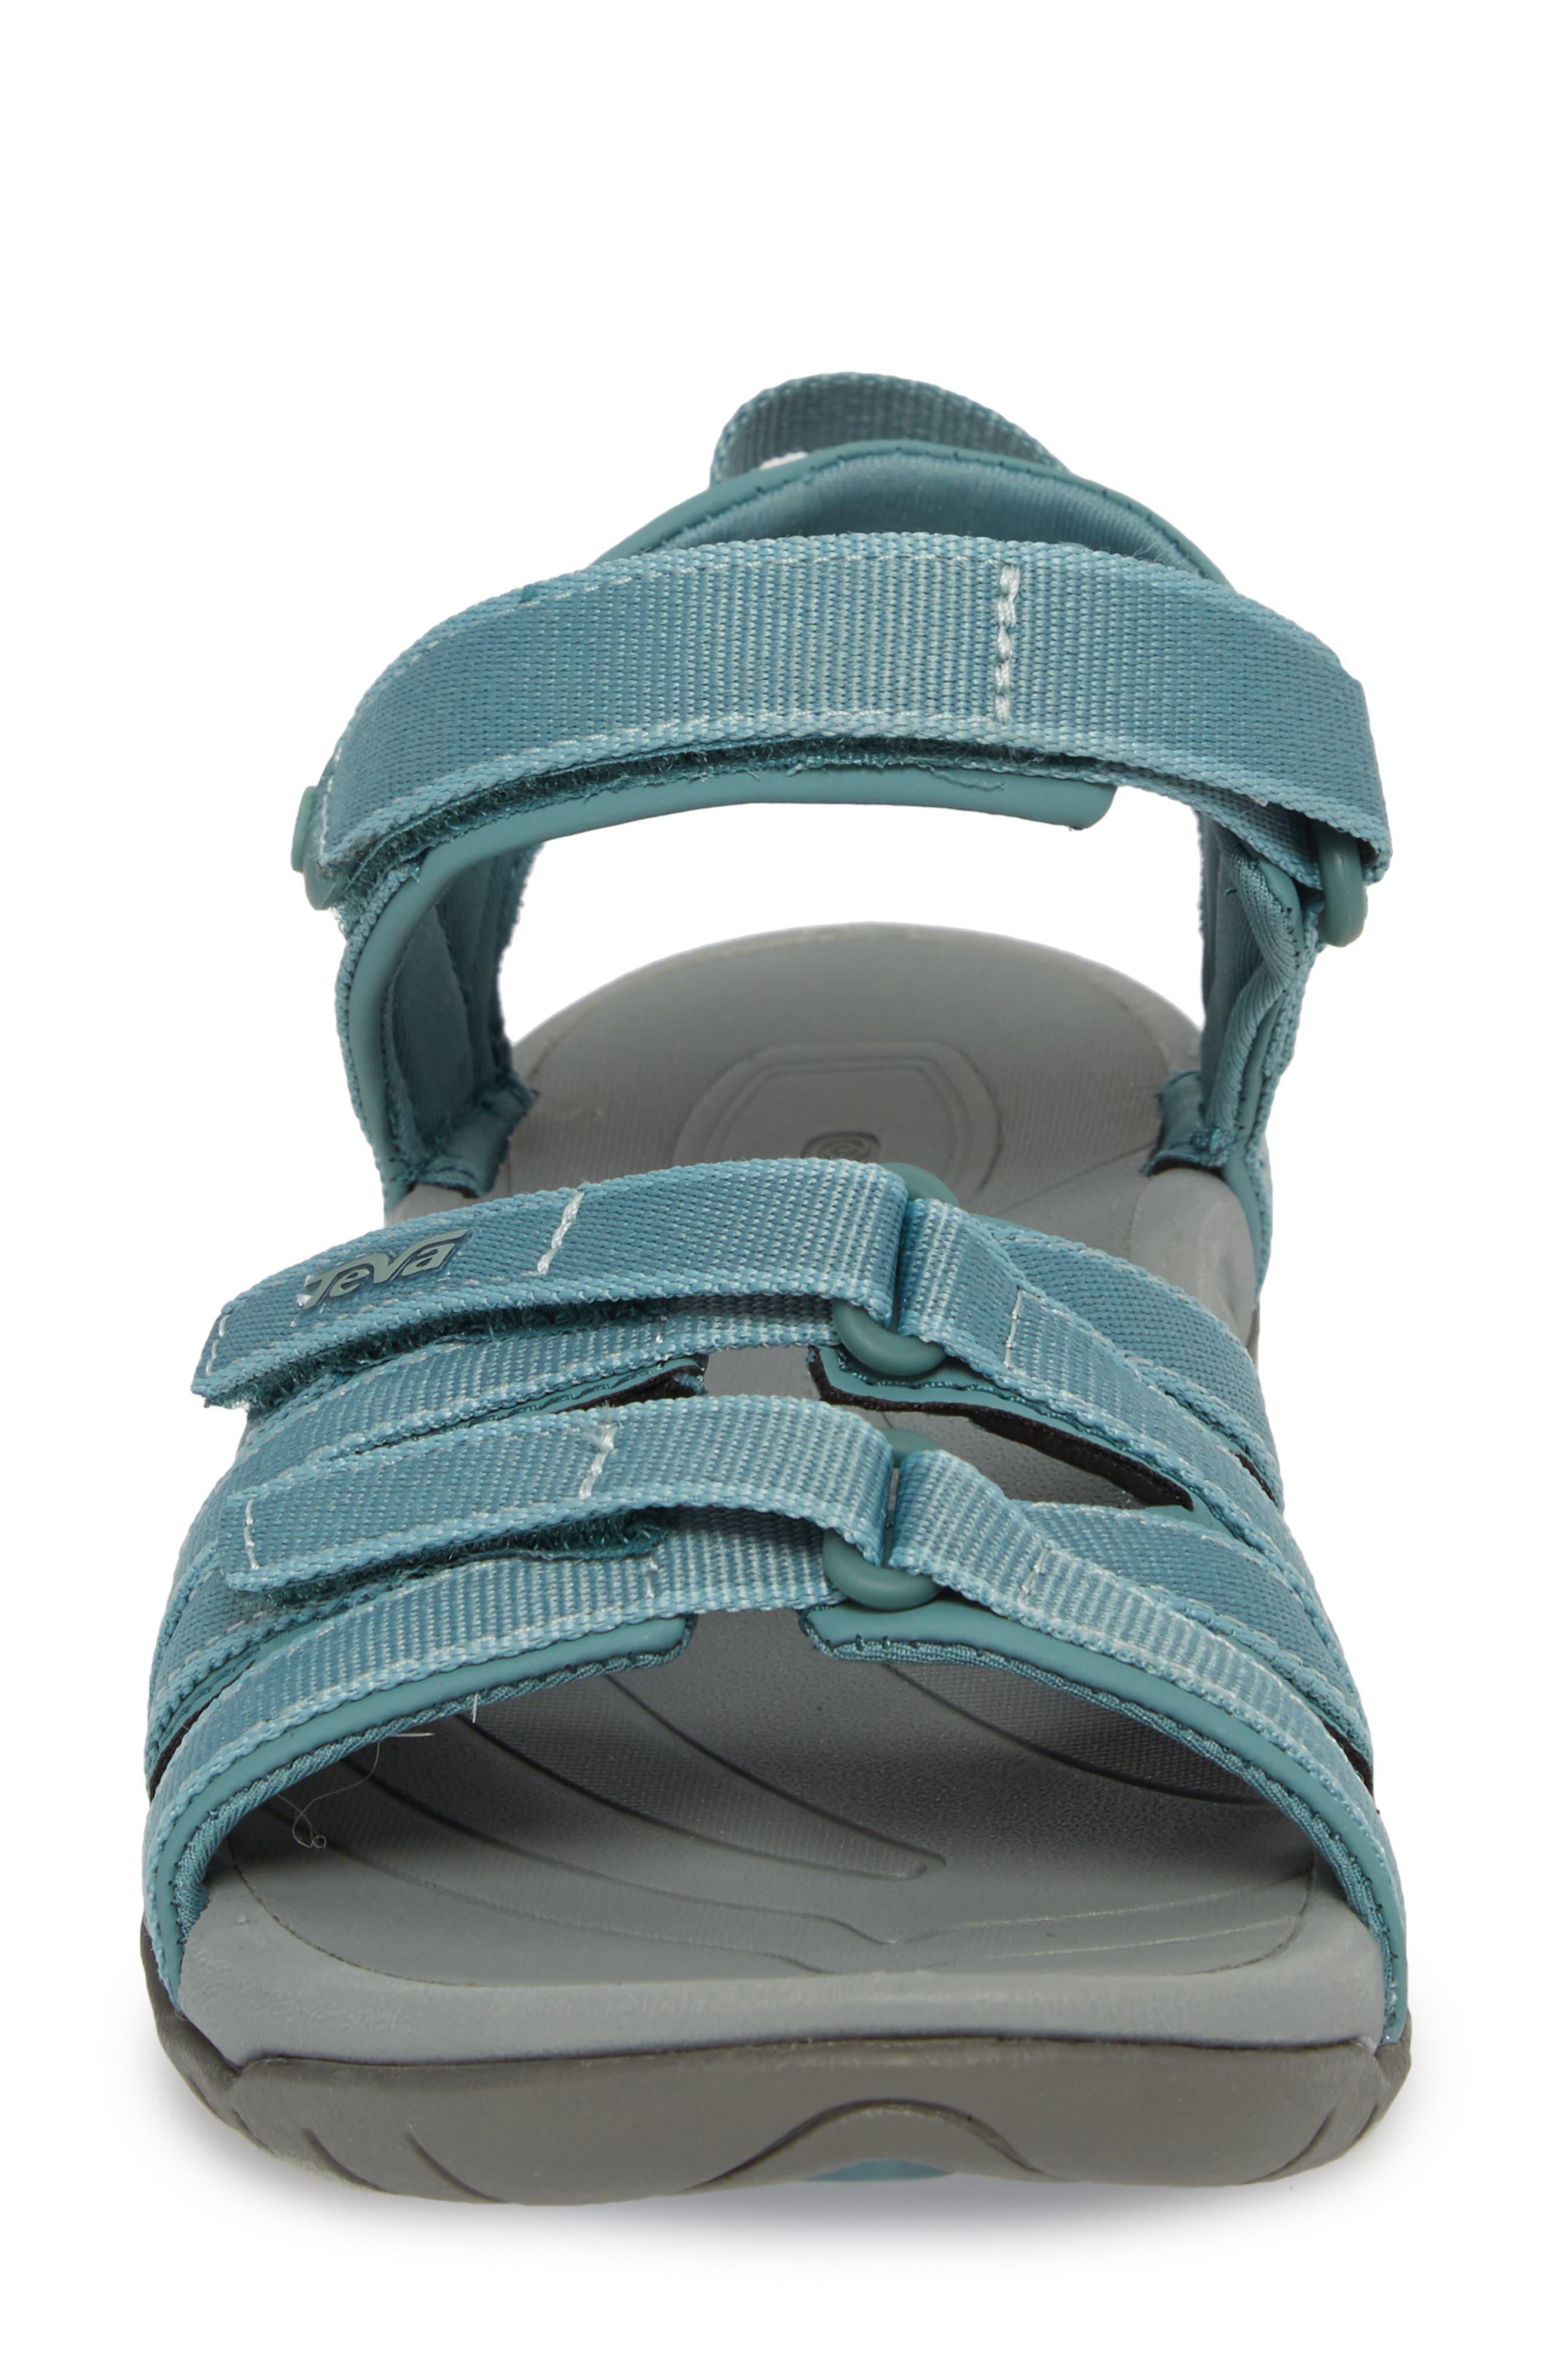 'Tirra' Sandal,                             Alternate thumbnail 4, color,                             NORTH ATLANTIC